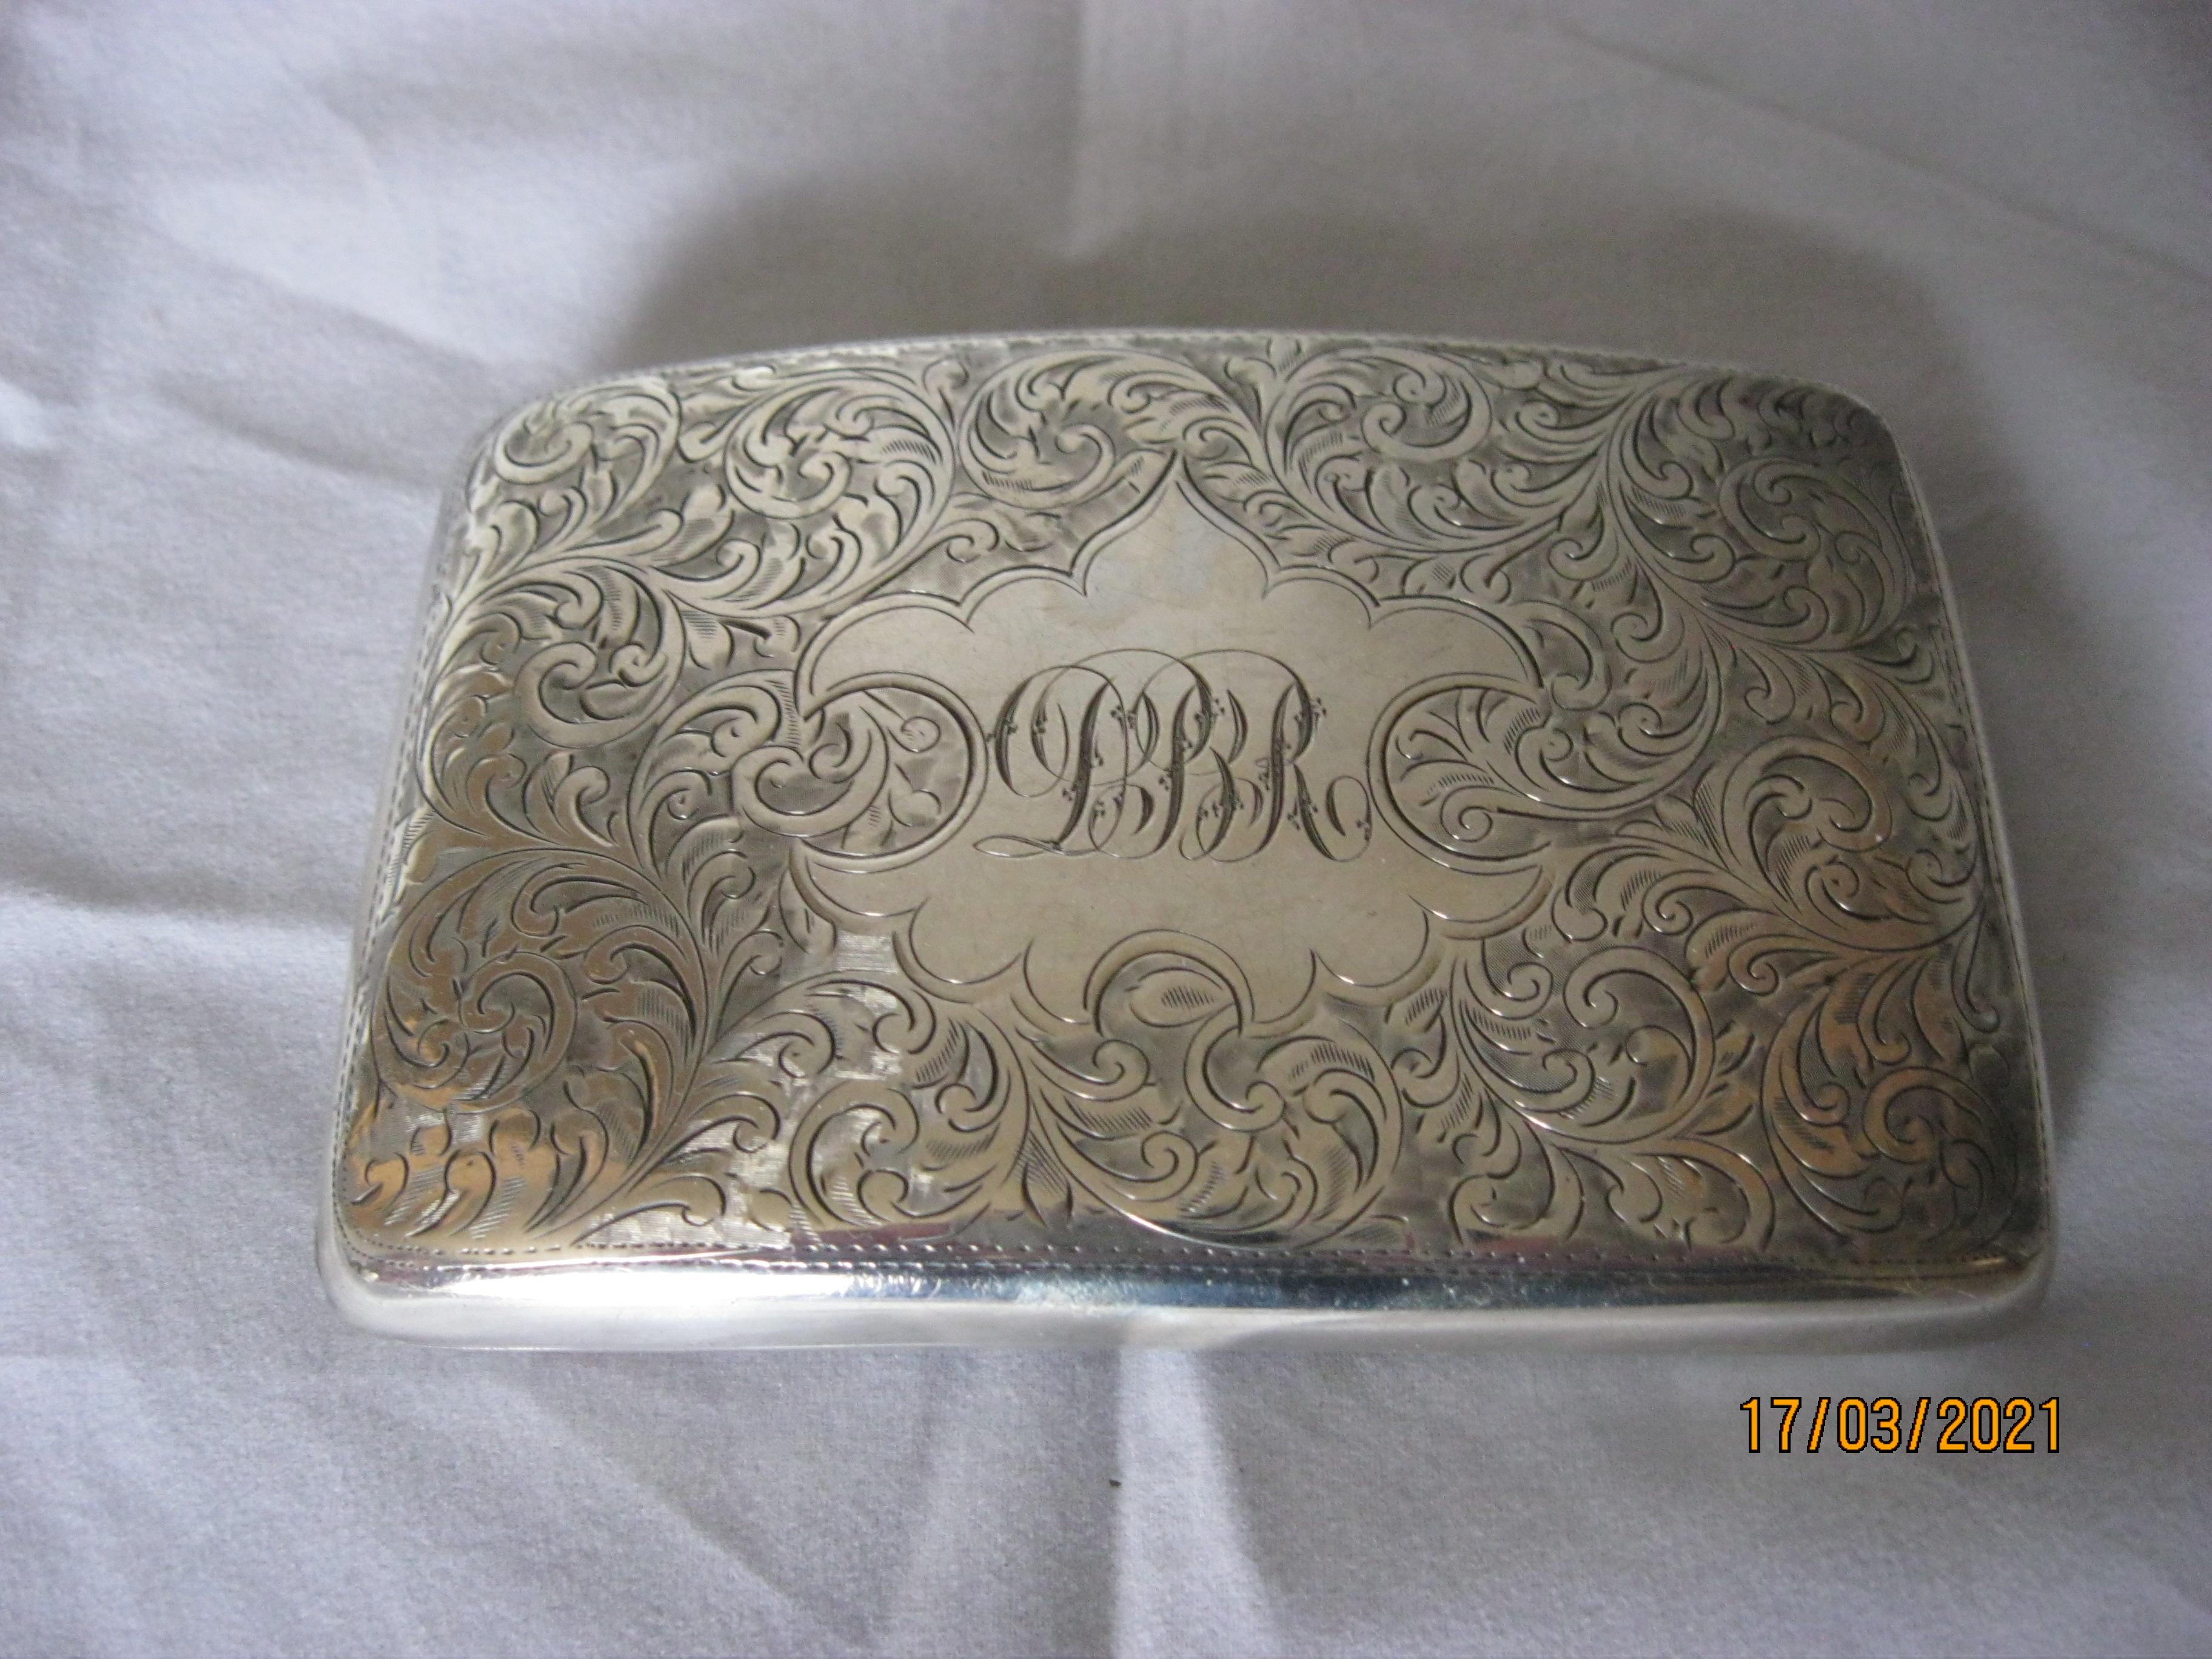 Antique Sterling Silver Cigarette Case 1921